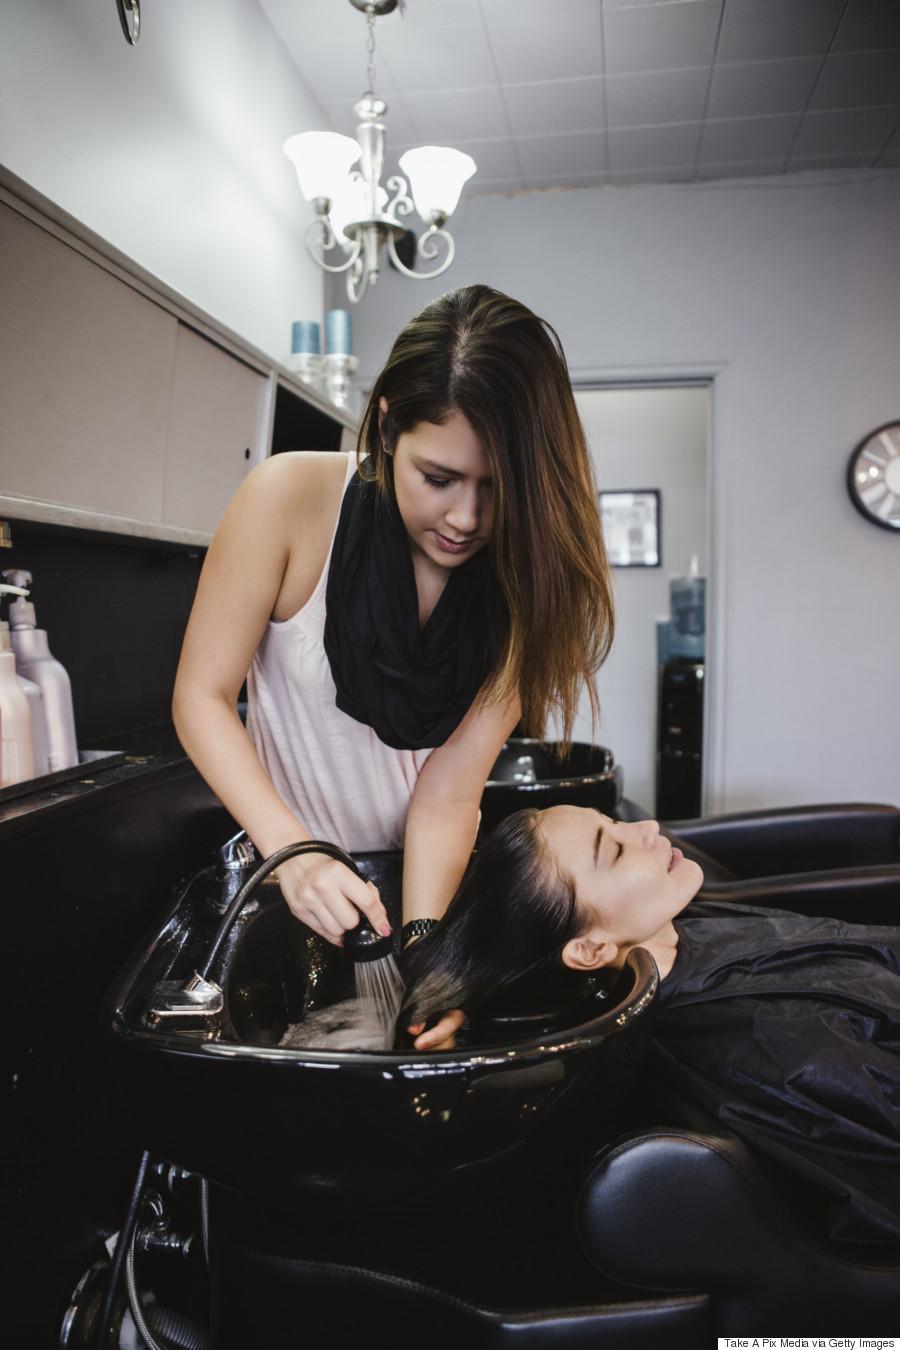 Shampooing pampered girls pinterest for Wash hair salon